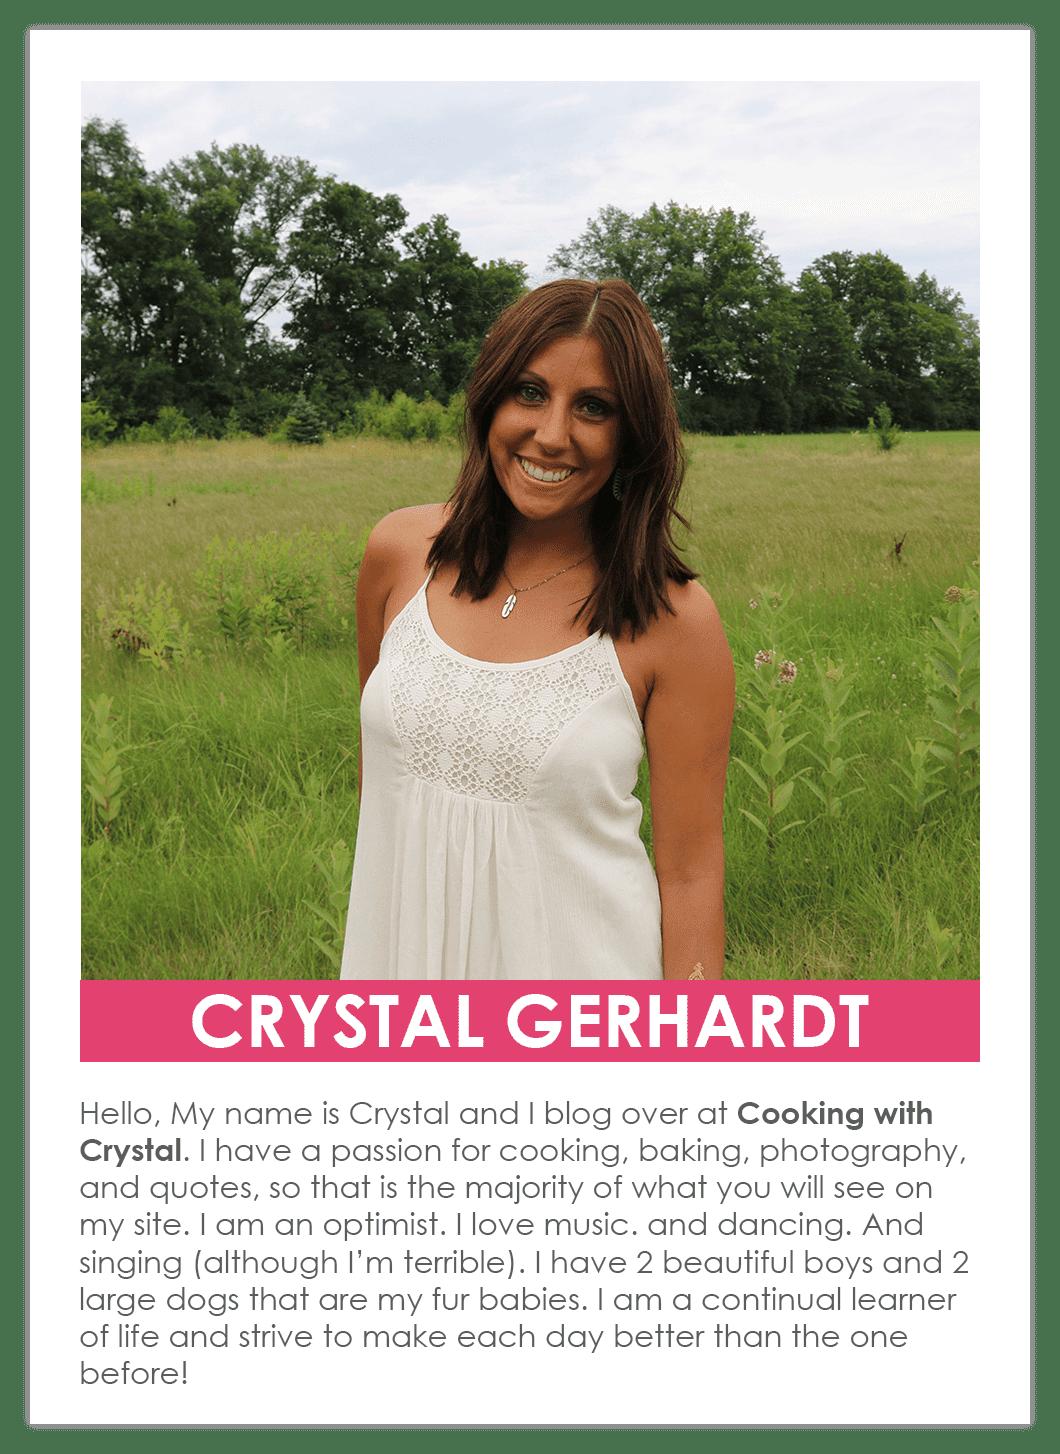 Crystal Gerhardt